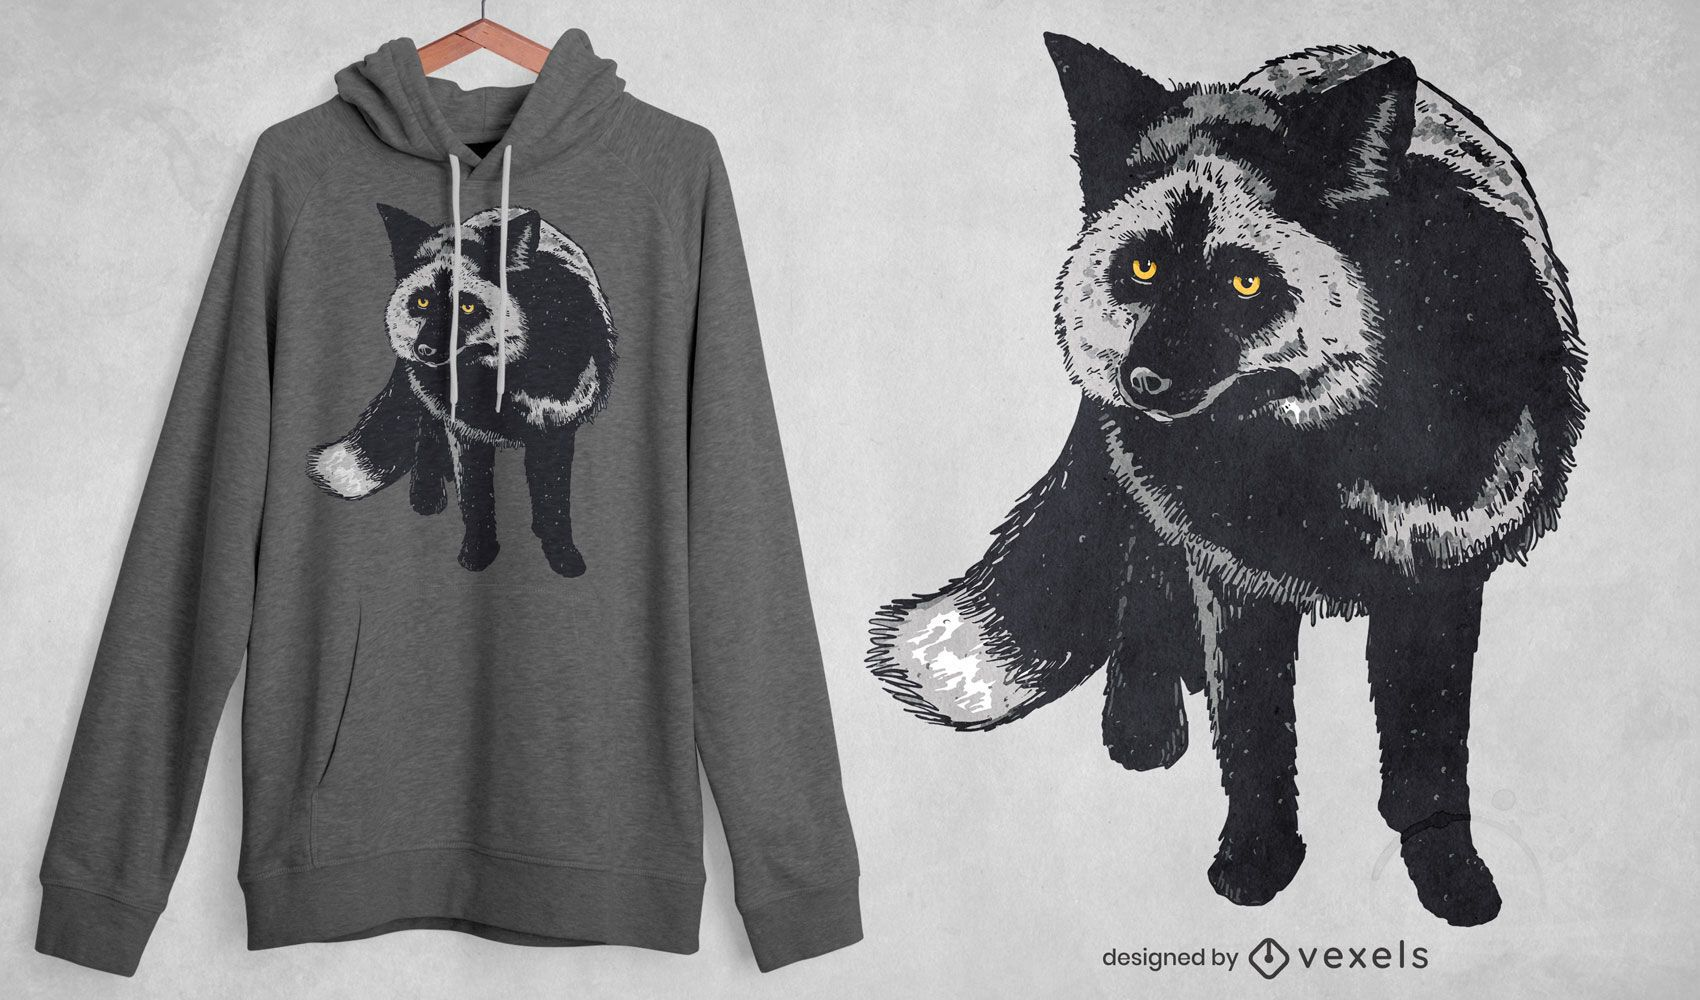 Silver fox realistic t-shirt design